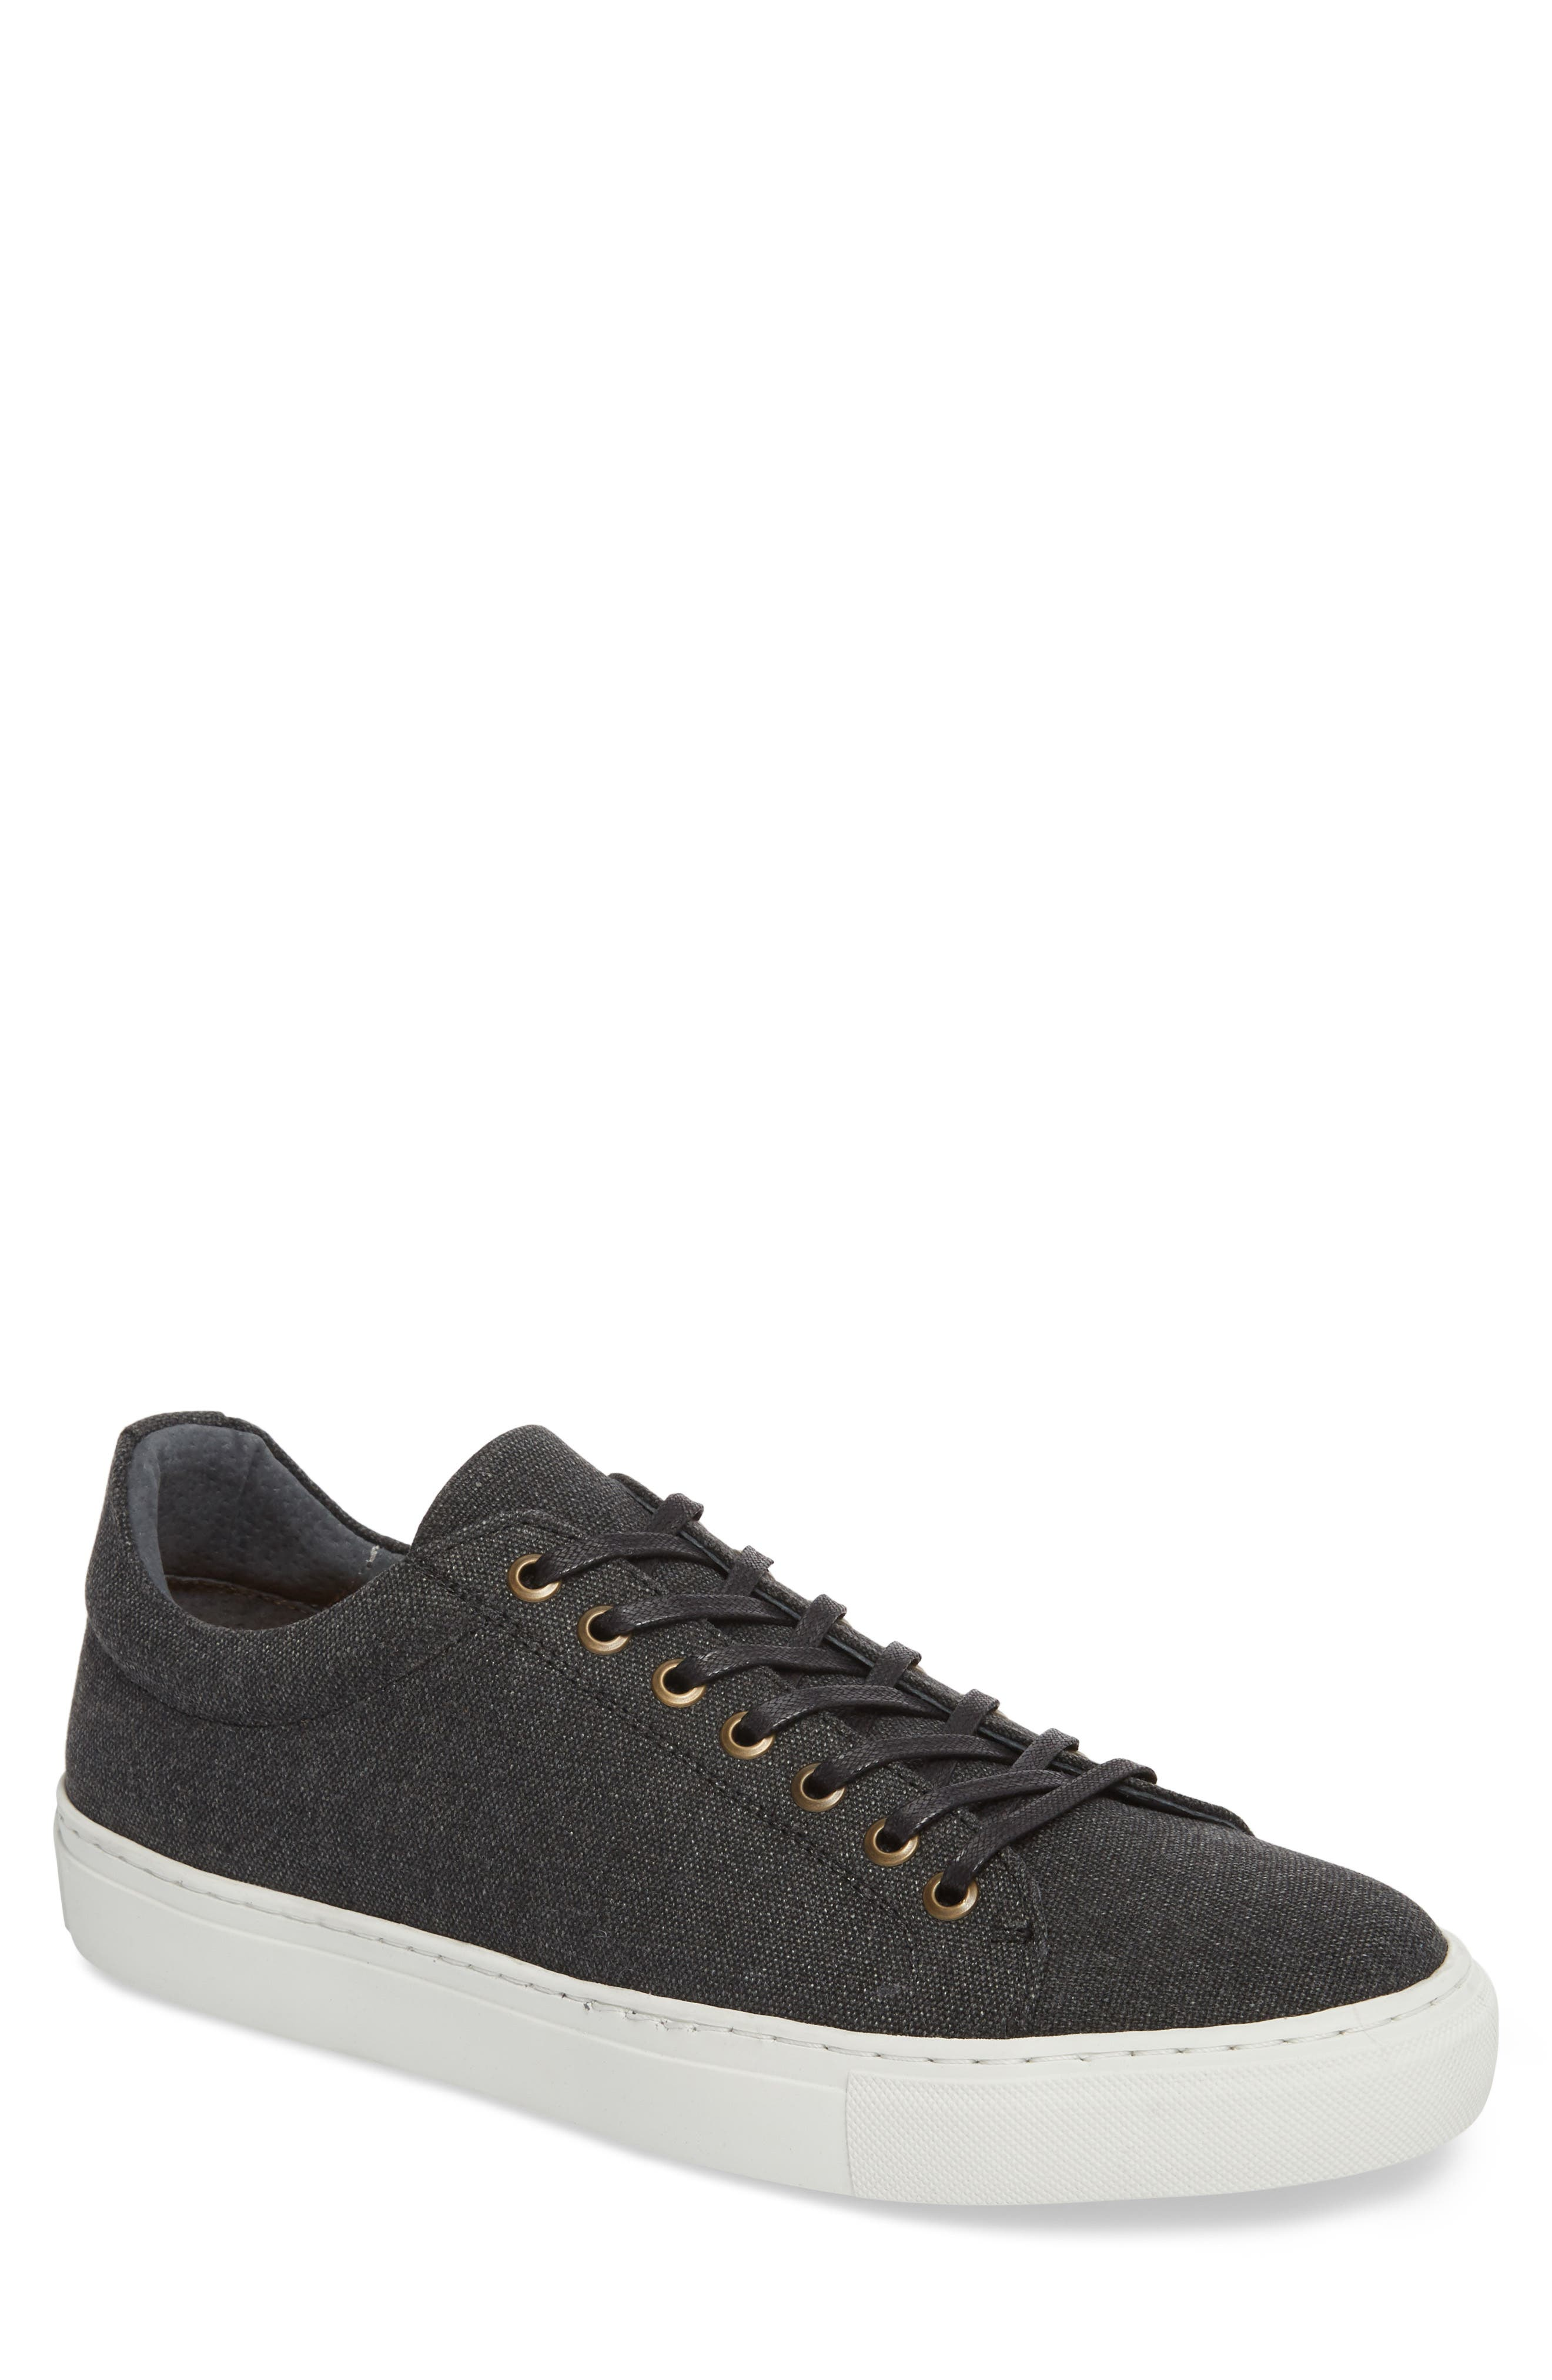 Mark Low Top Sneaker,                         Main,                         color, Black Canvas